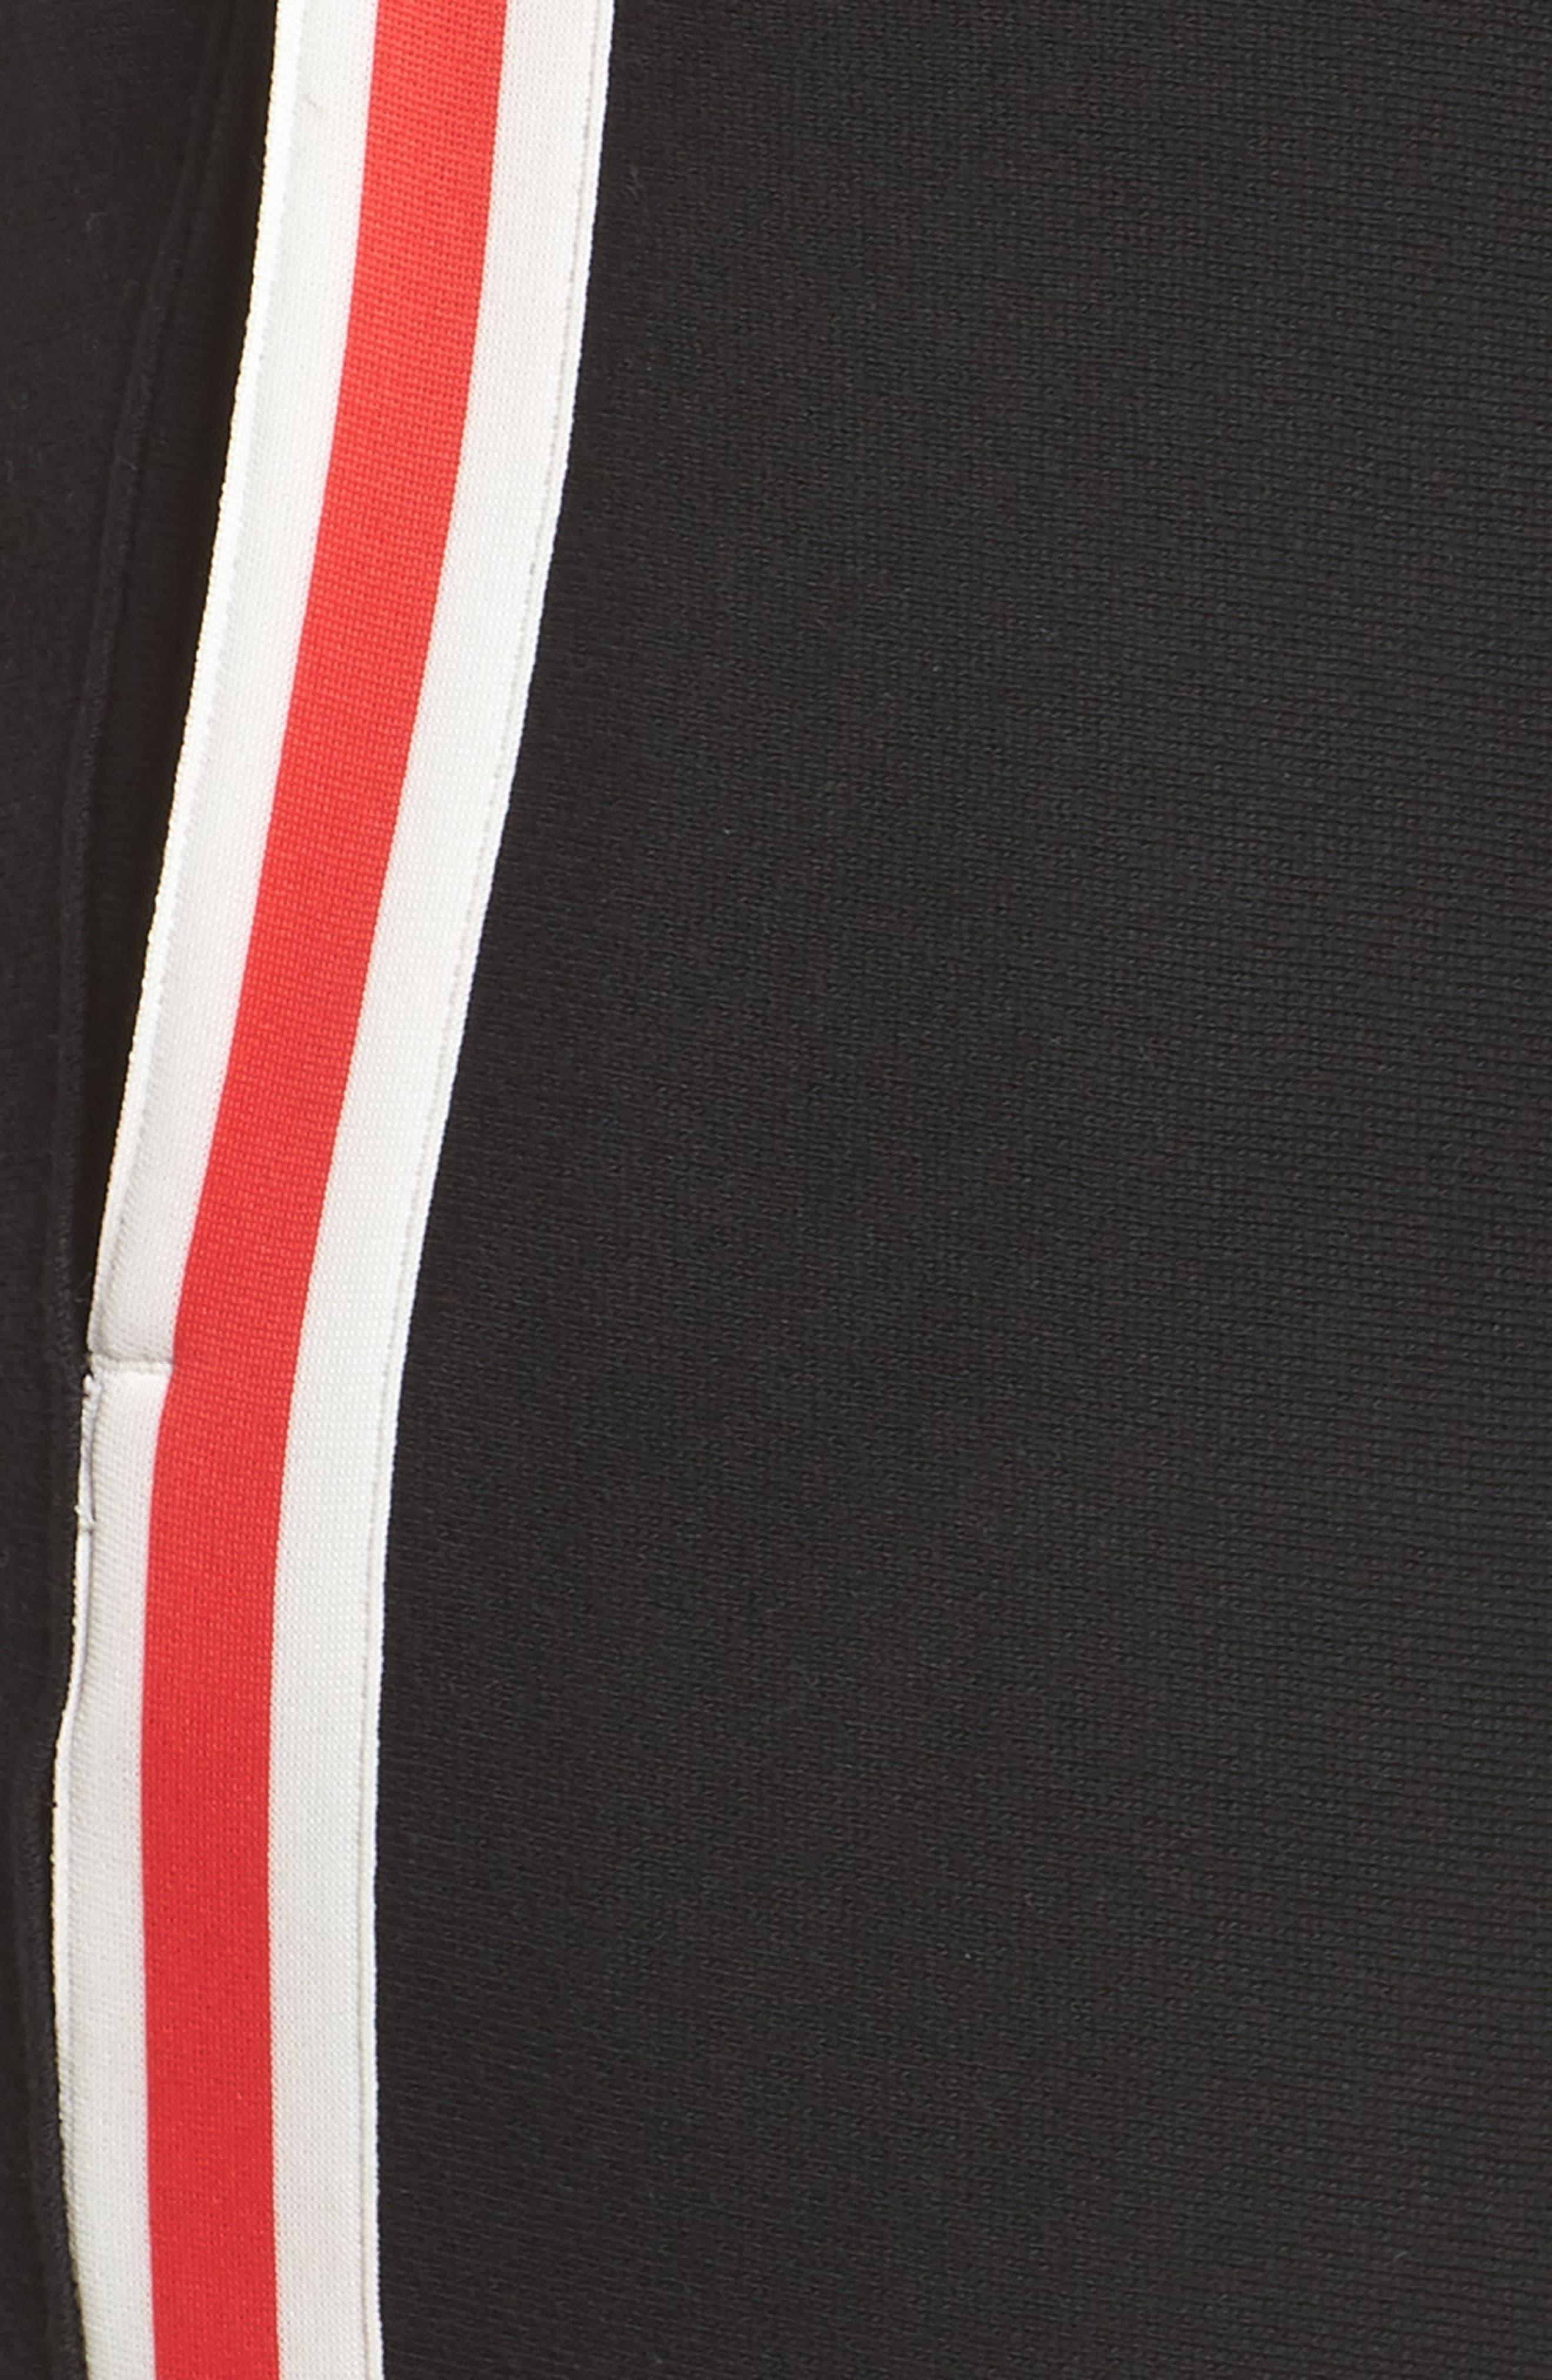 Color Block Jogger Pants,                             Alternate thumbnail 9, color,                             BLACK/ GRANITE HEATHER